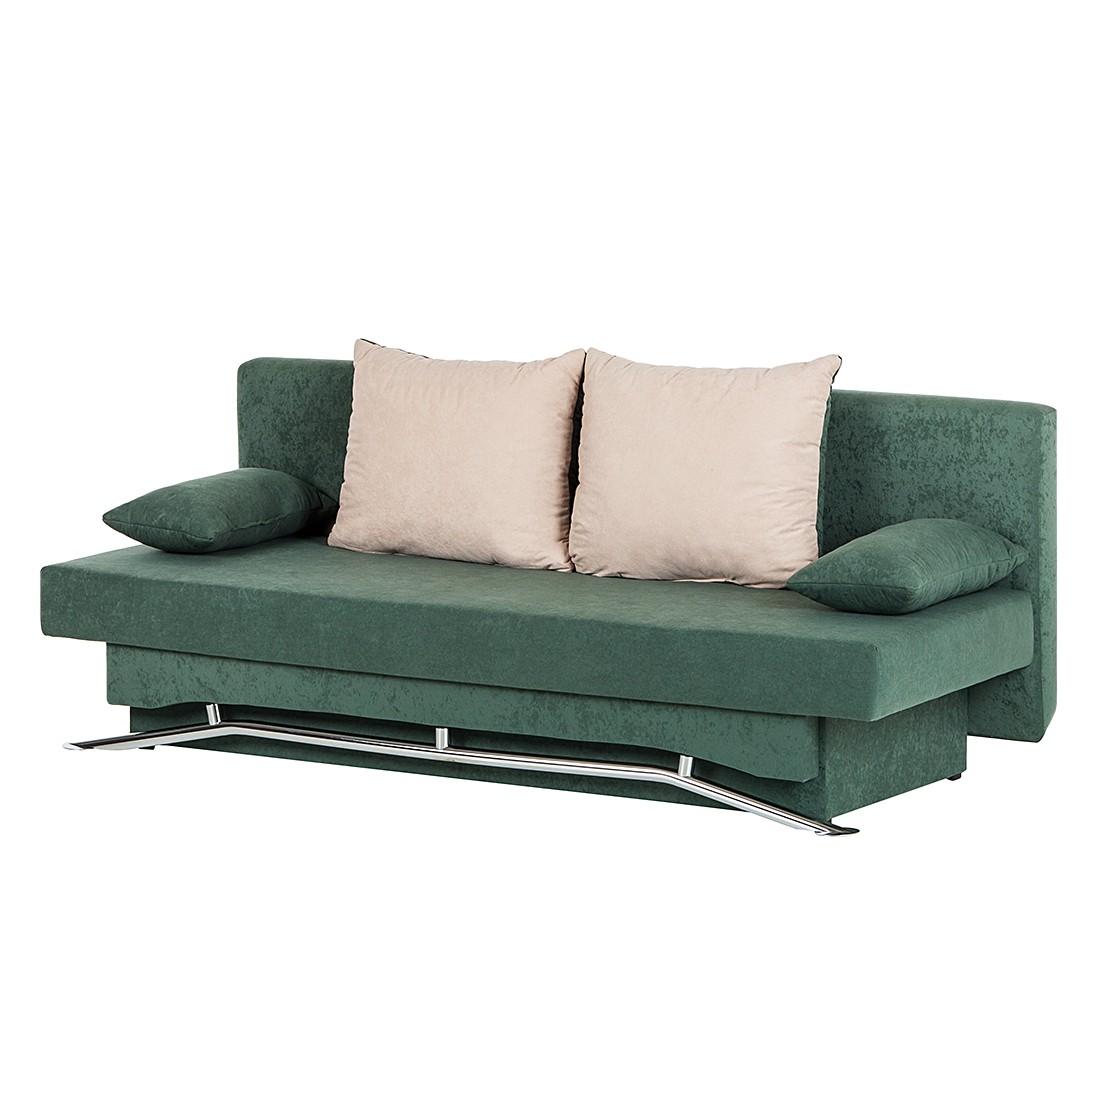 schlafsofa bestellen monja mit matratze schlafsofa ikea. Black Bedroom Furniture Sets. Home Design Ideas